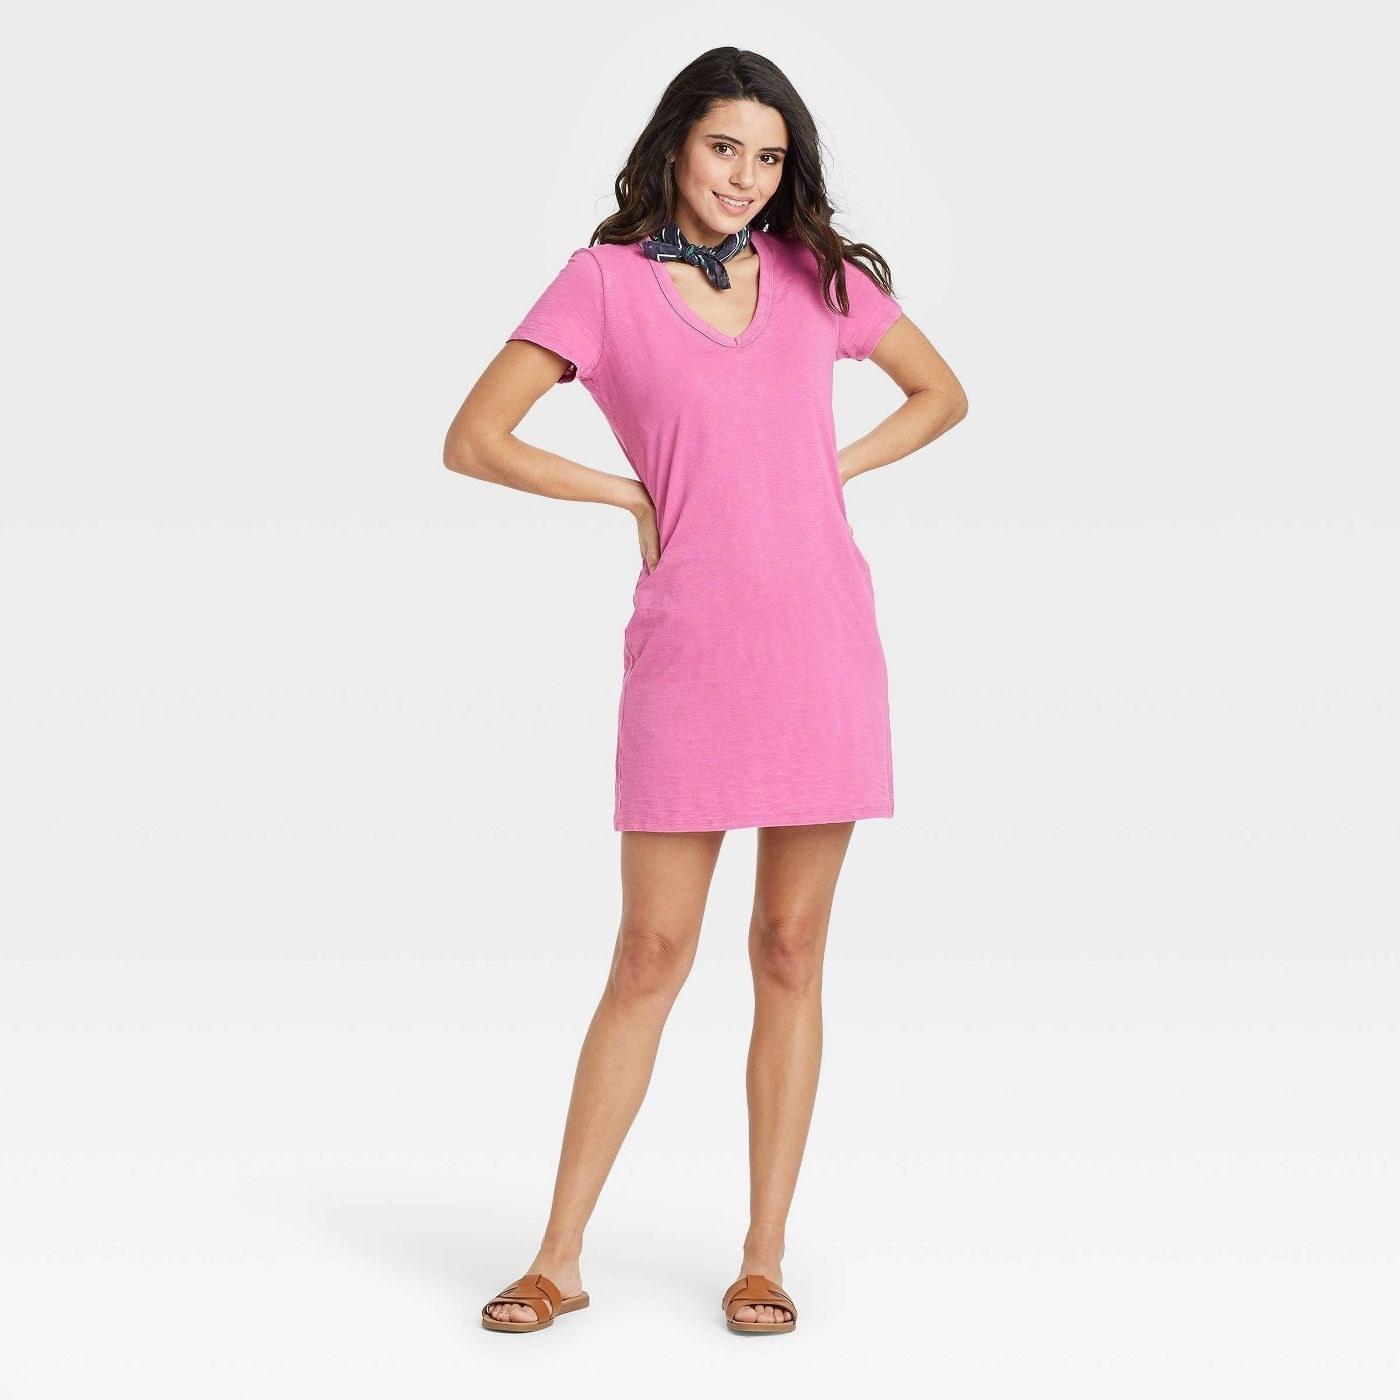 Model wearing pink mini dress